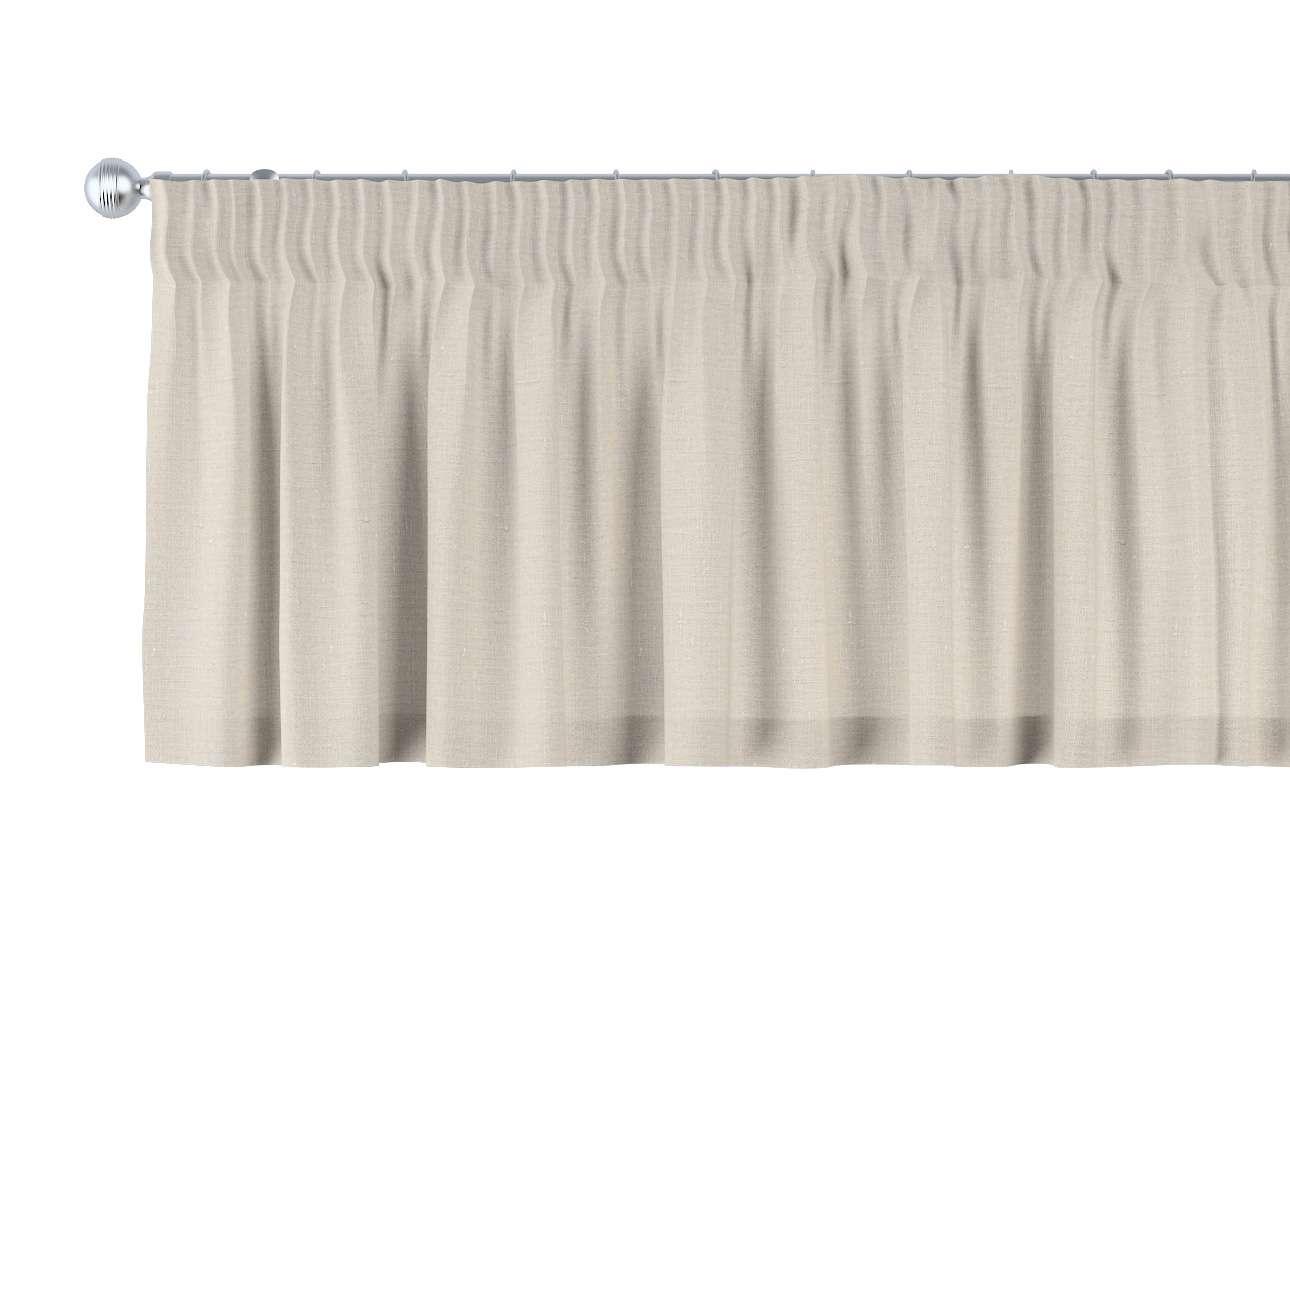 Gardinkappa med rynkband 130 x 40 cm i kollektionen Linne, Tyg: 392-05